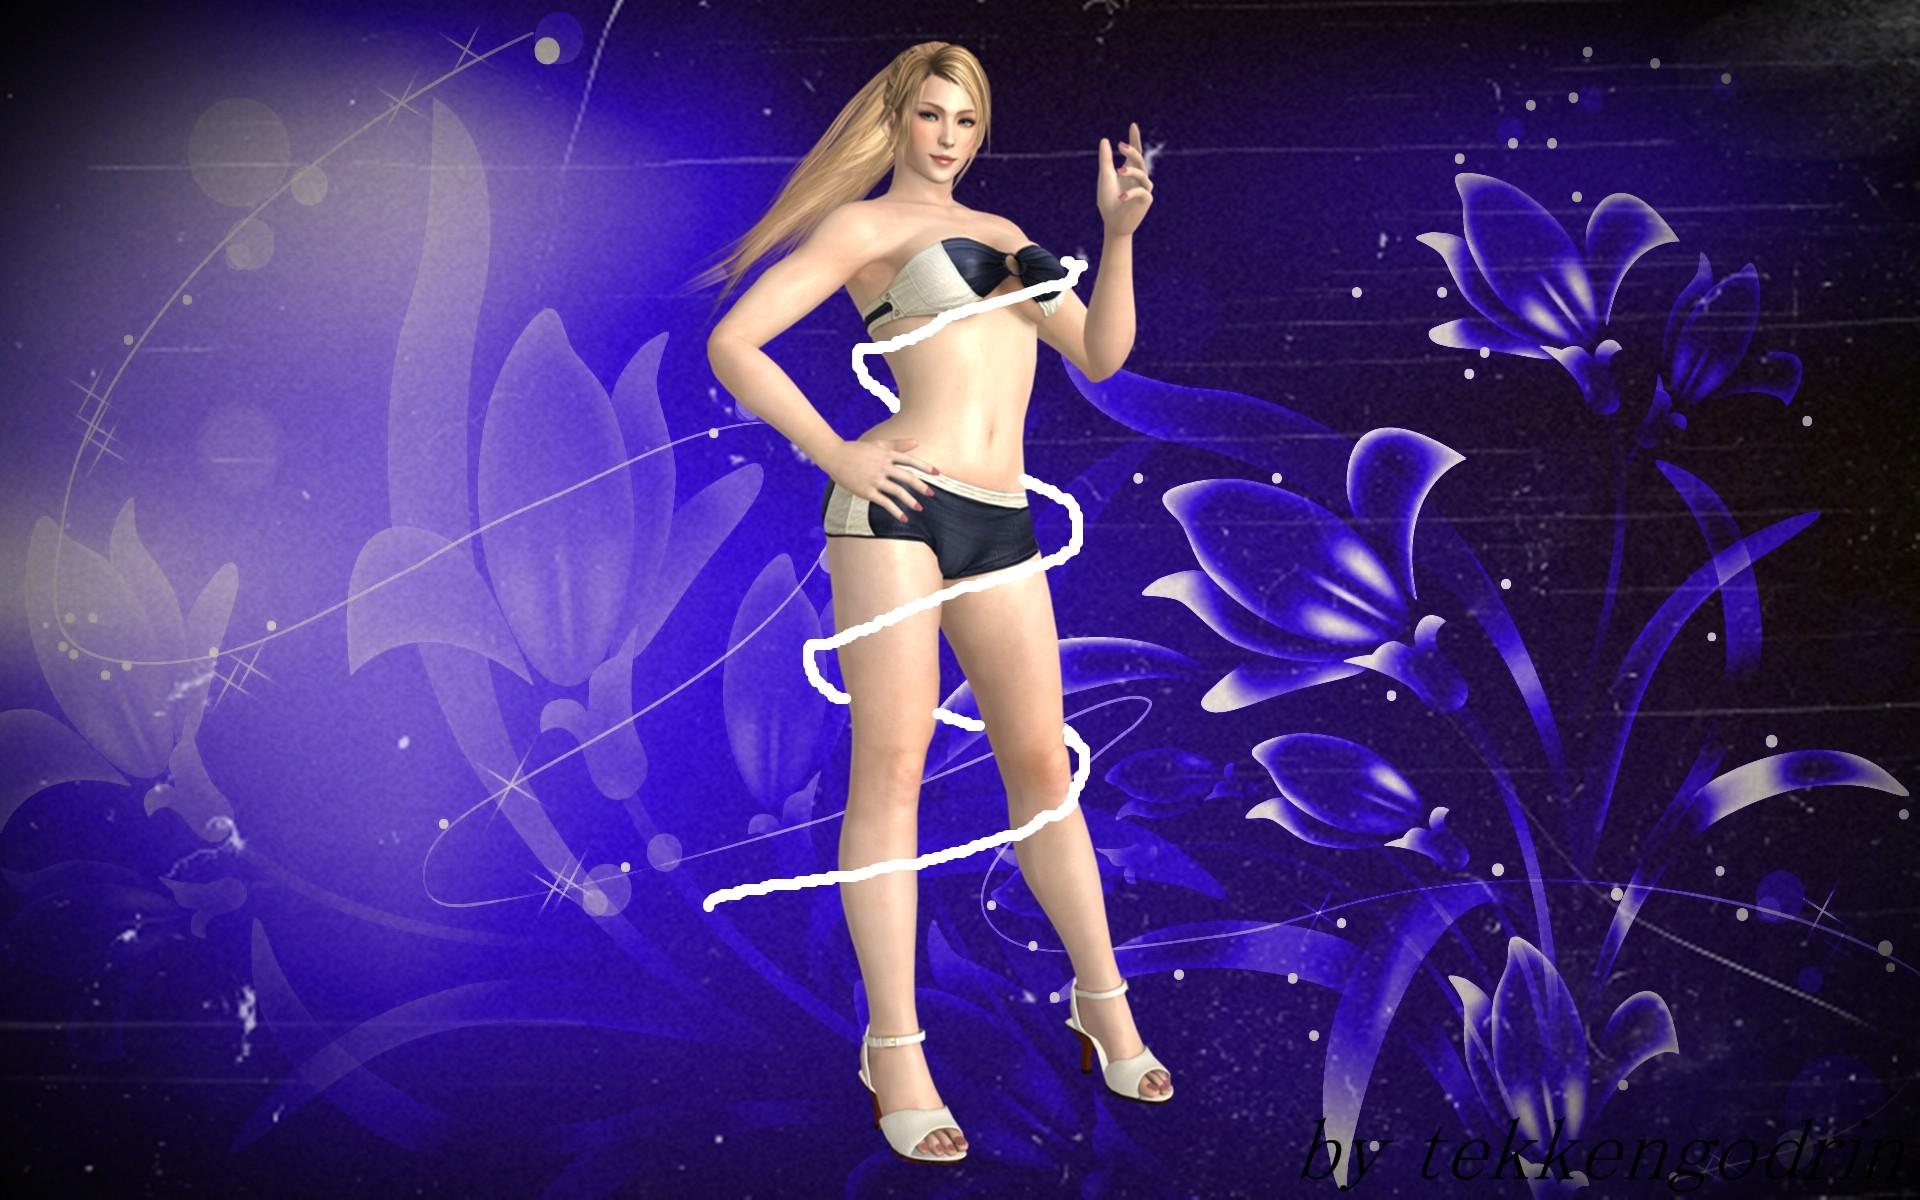 … Dead Or Alive 5 Sarah Wallpaper by TekkenGodRin